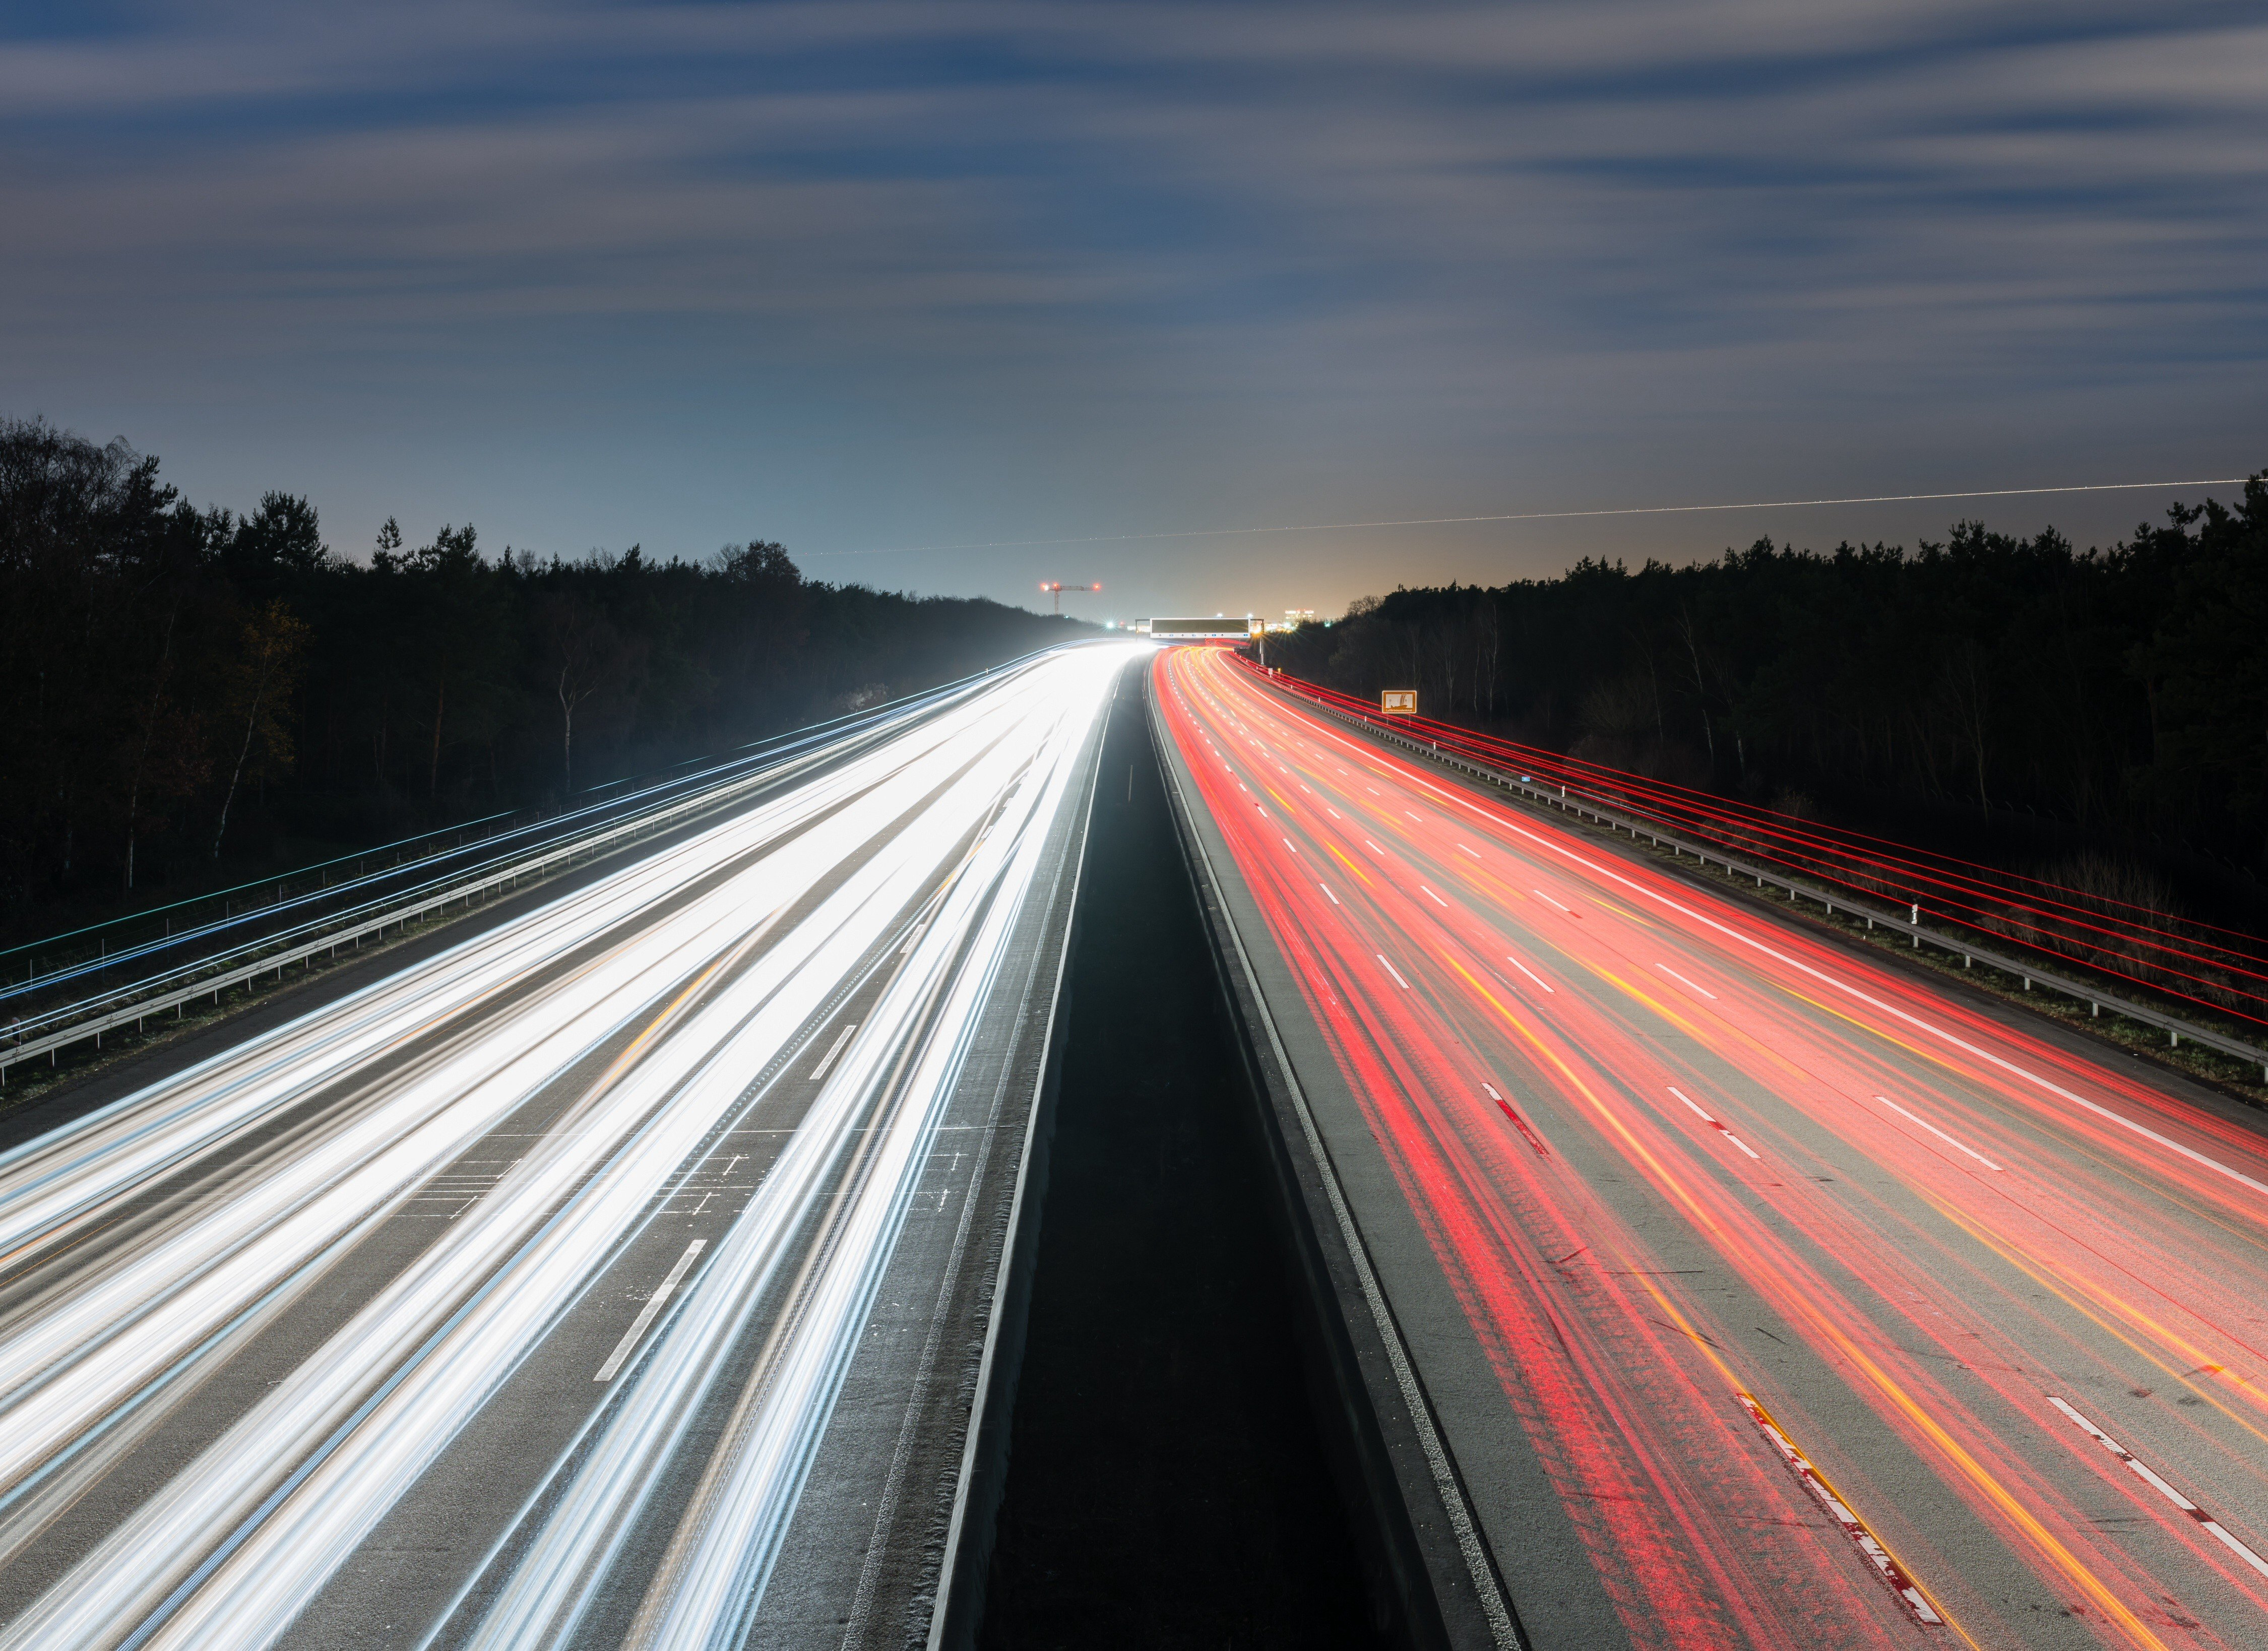 Road, Traffic Lights, Long Exposure, Night, Highway, Trees